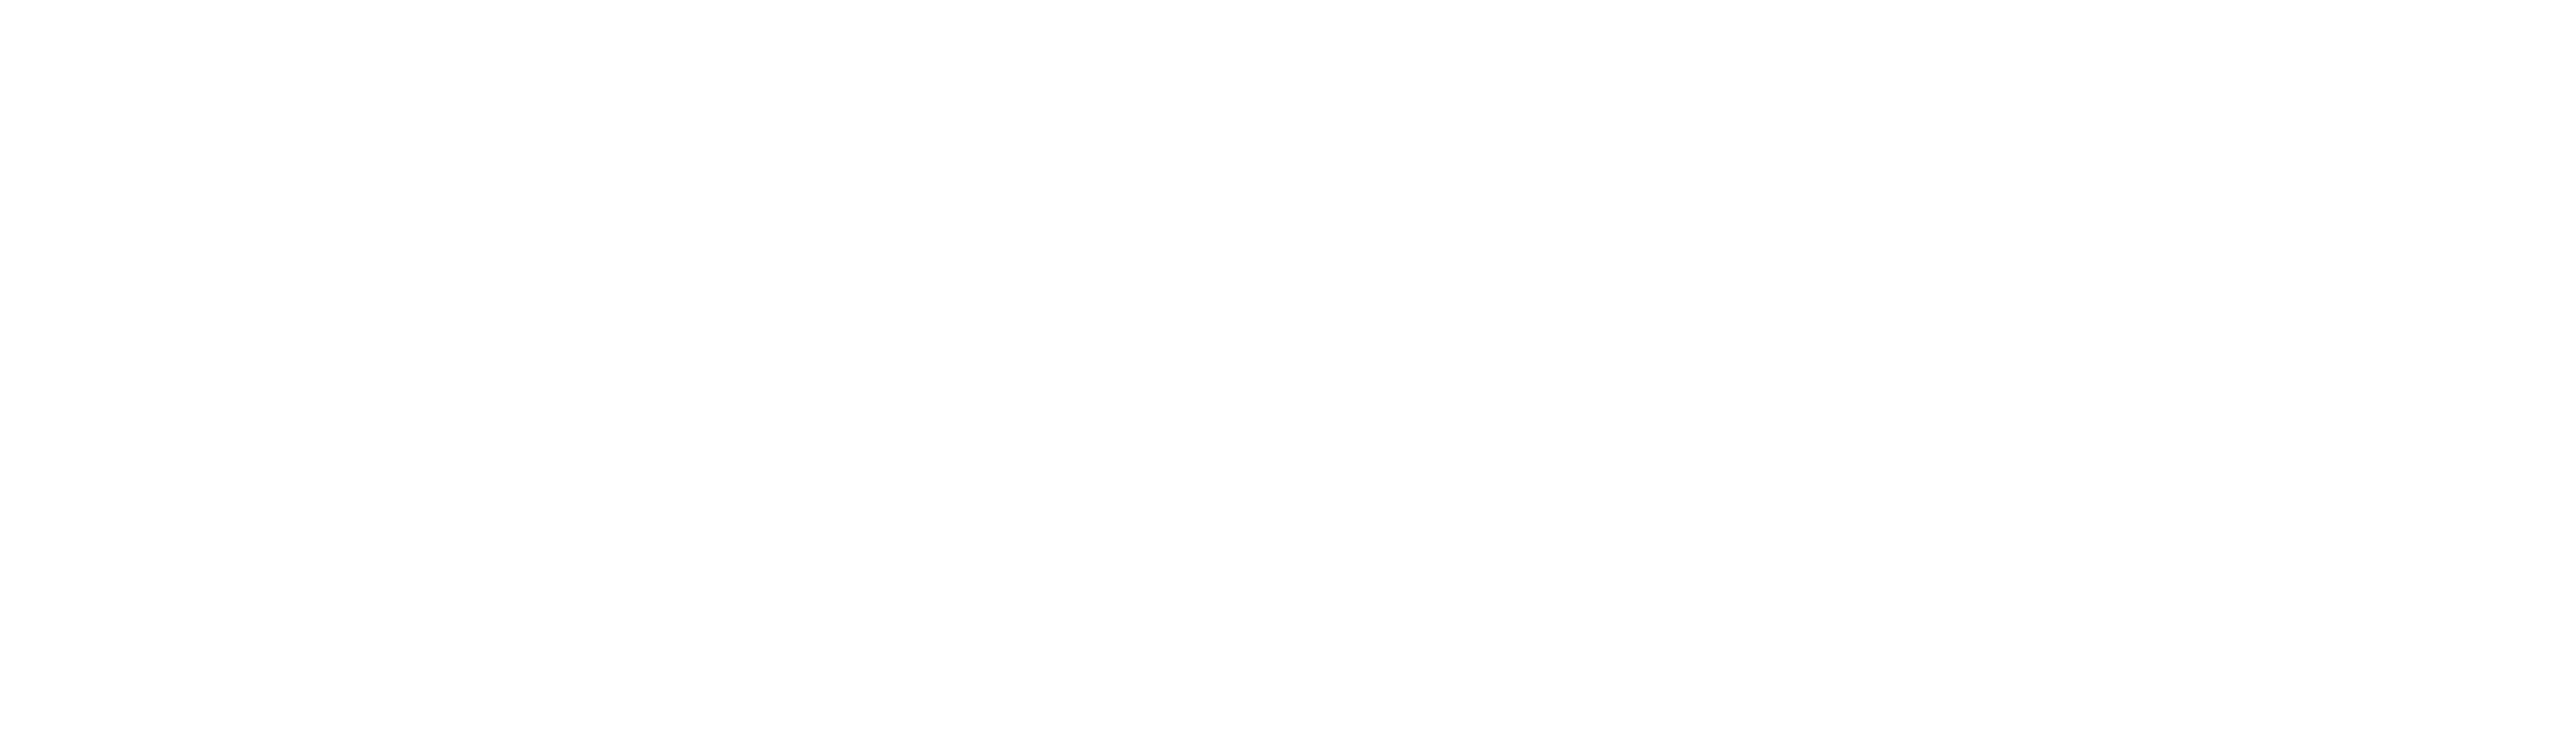 CMMA 3 - White